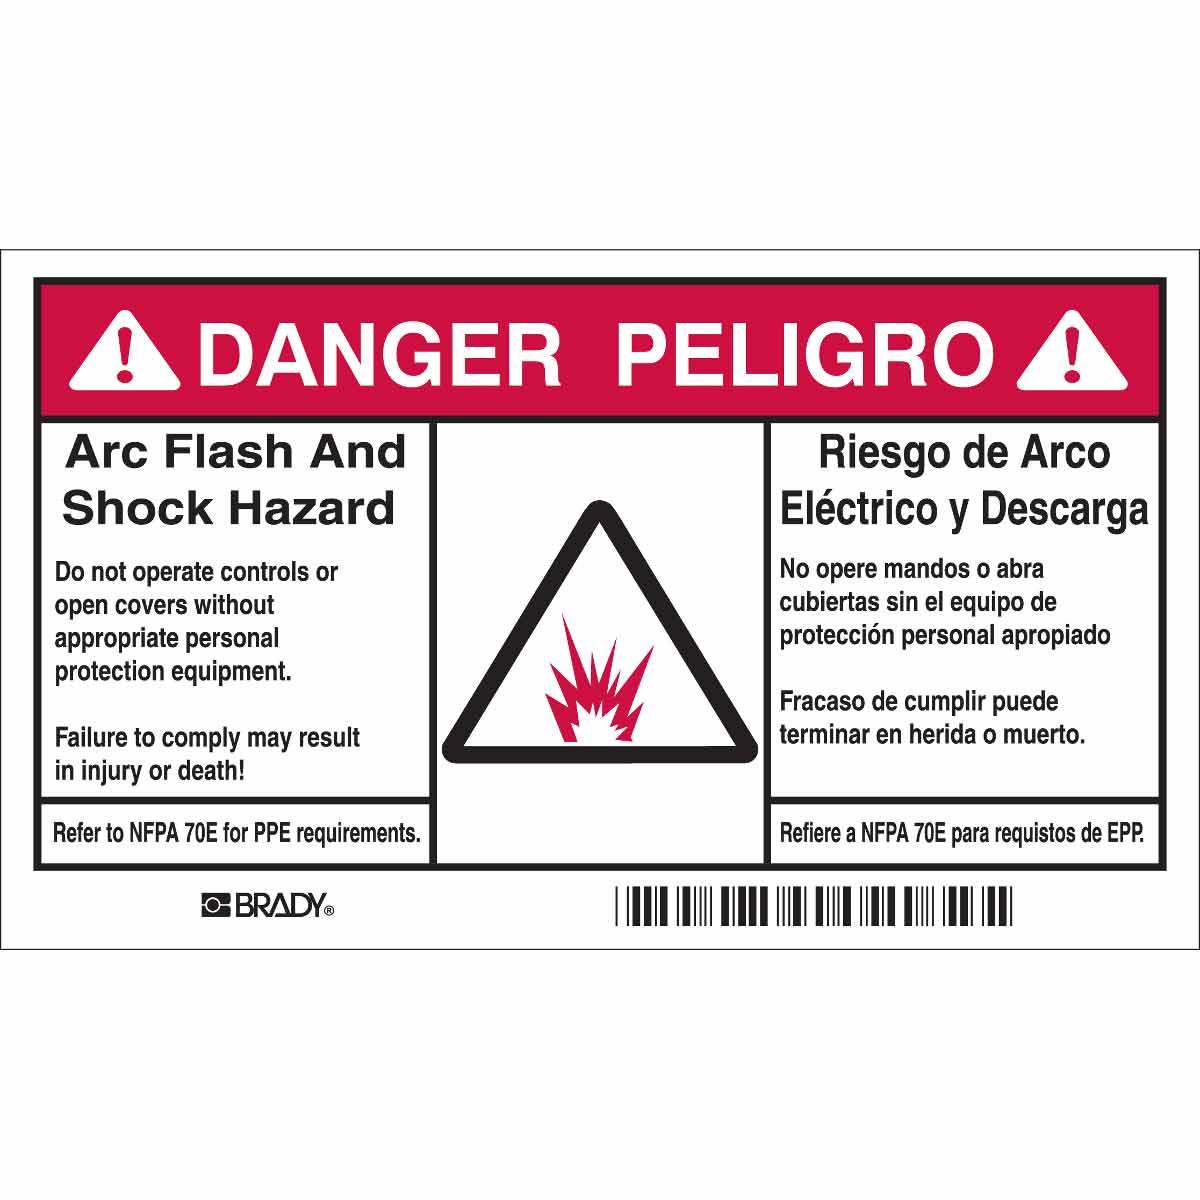 Brady Part 102312 B302 35x6 Blk Red W 100 Rl Flashshock Admittance Triangle For A Parallel Rlc Circuit